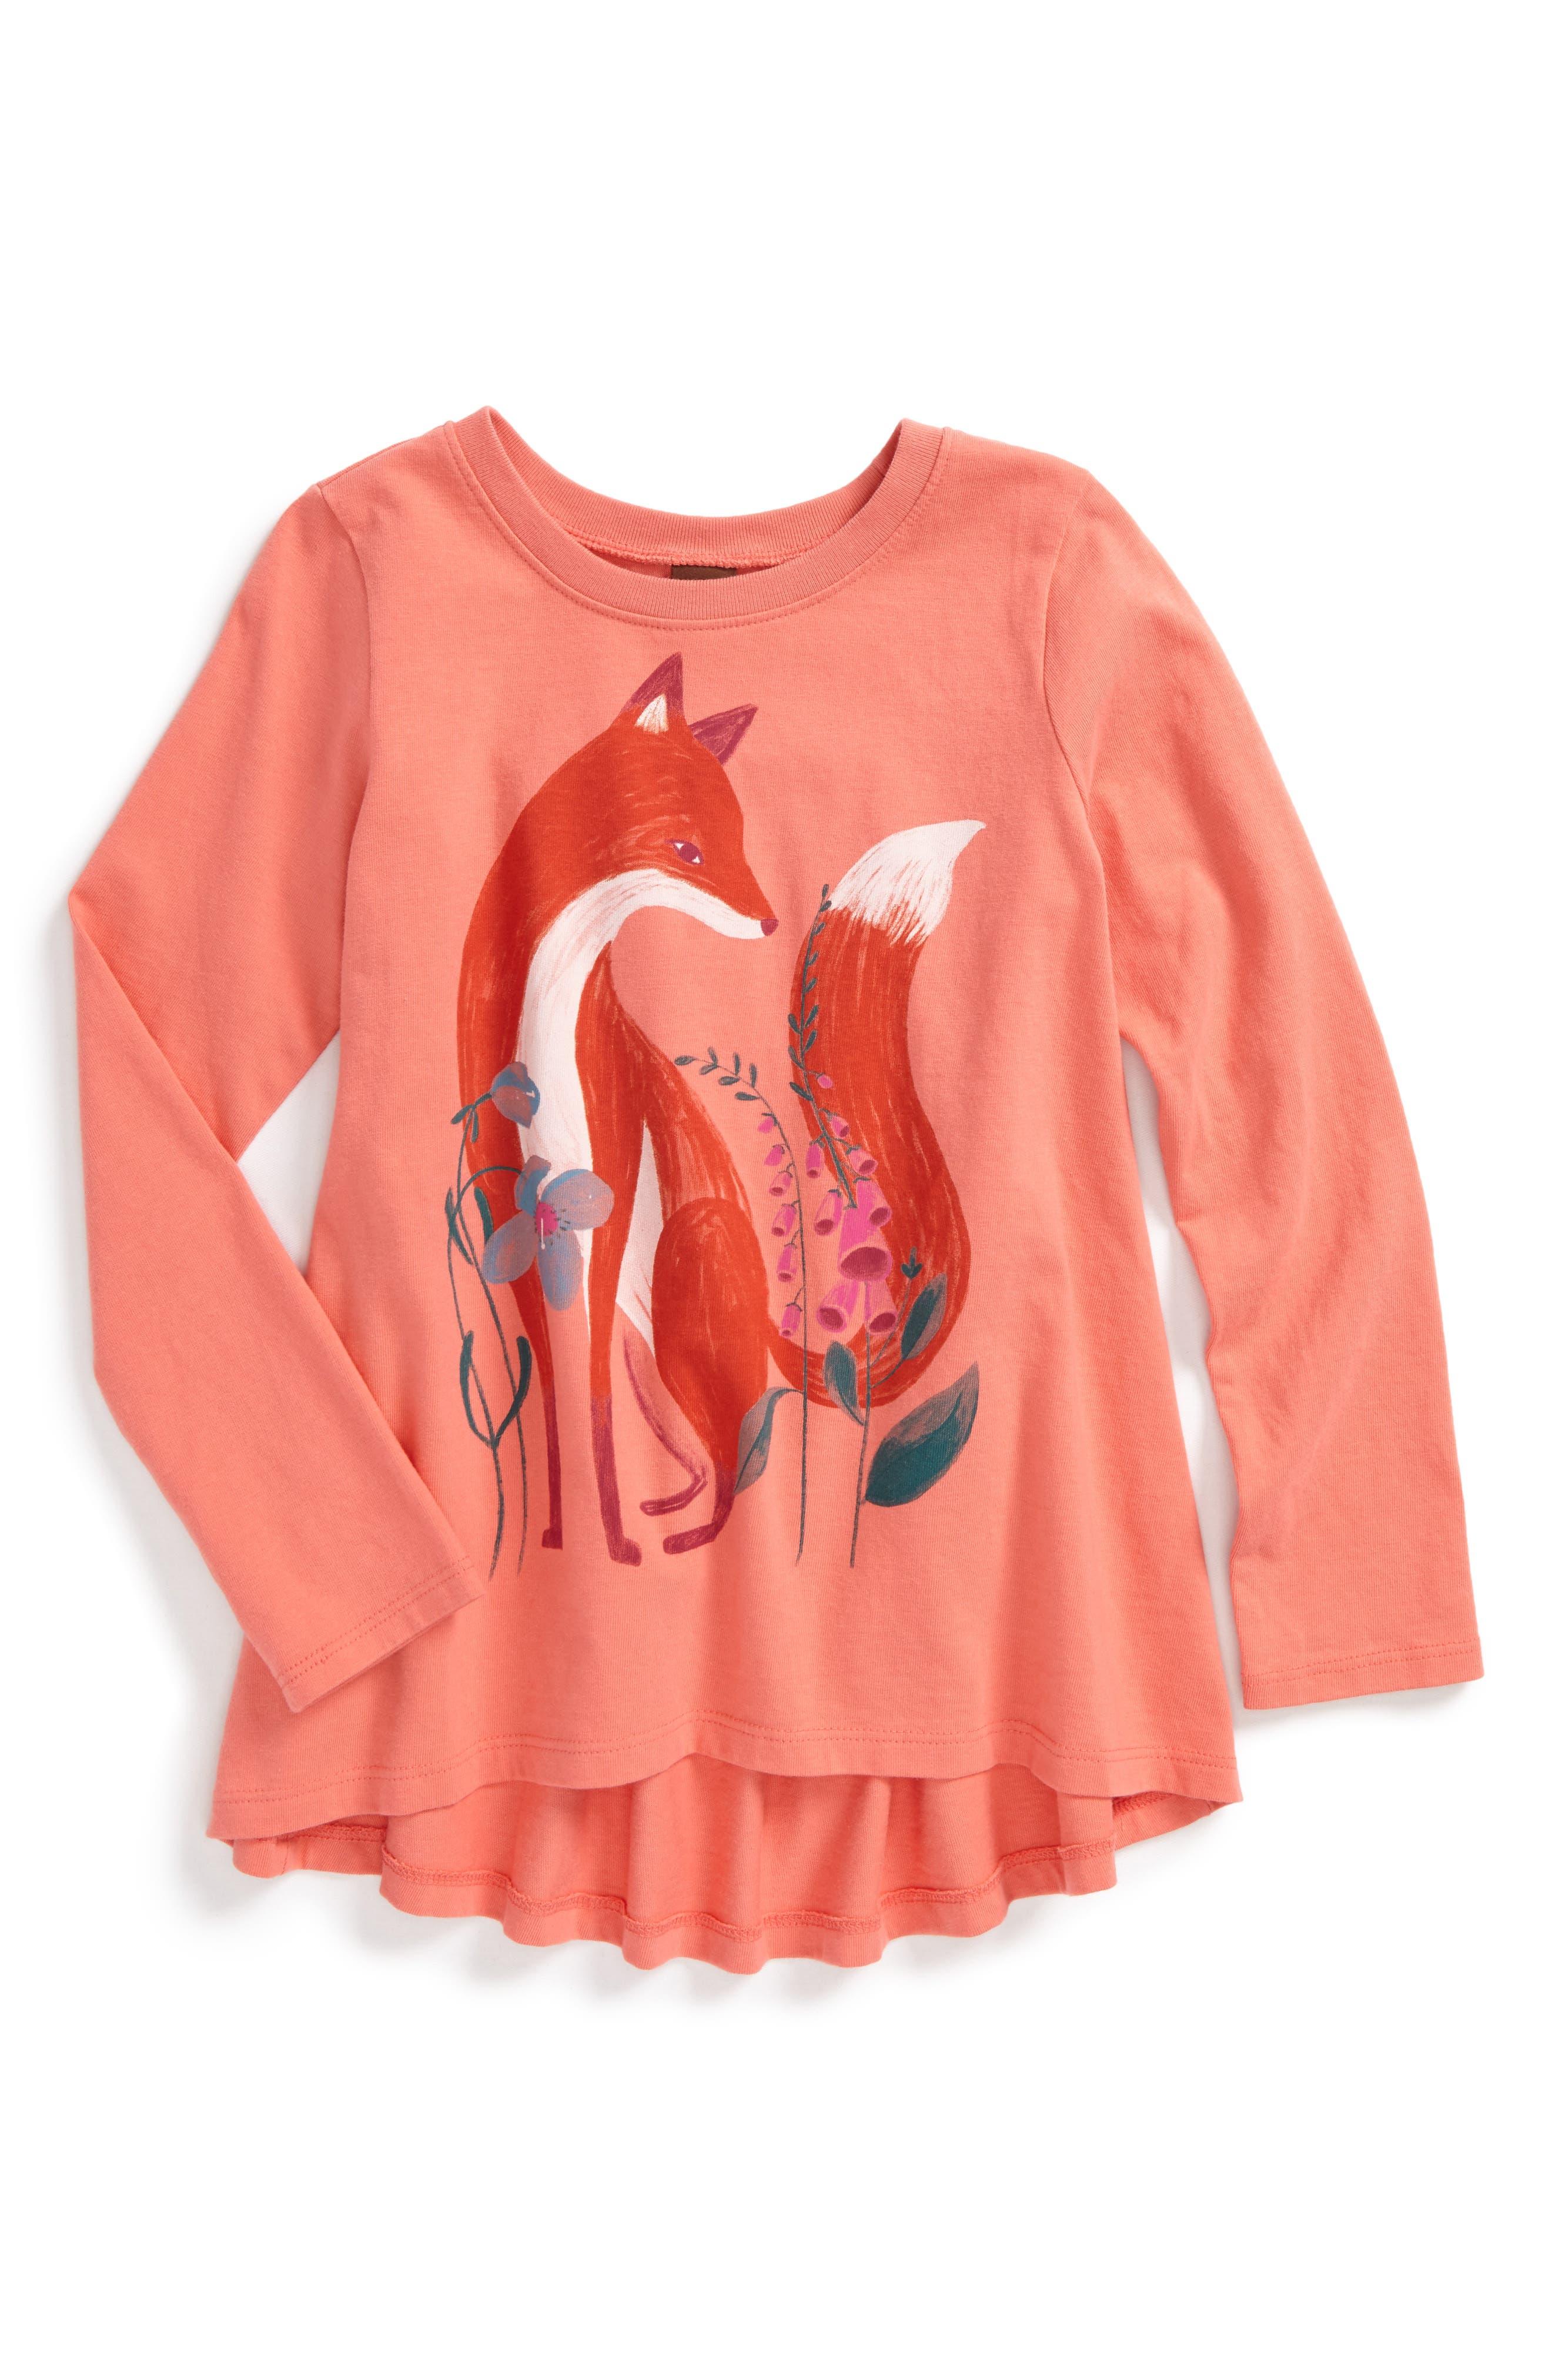 Main Image - Tea Collection Orain Twirl Top (Toddler Girls, Little Girls & Big Girls)